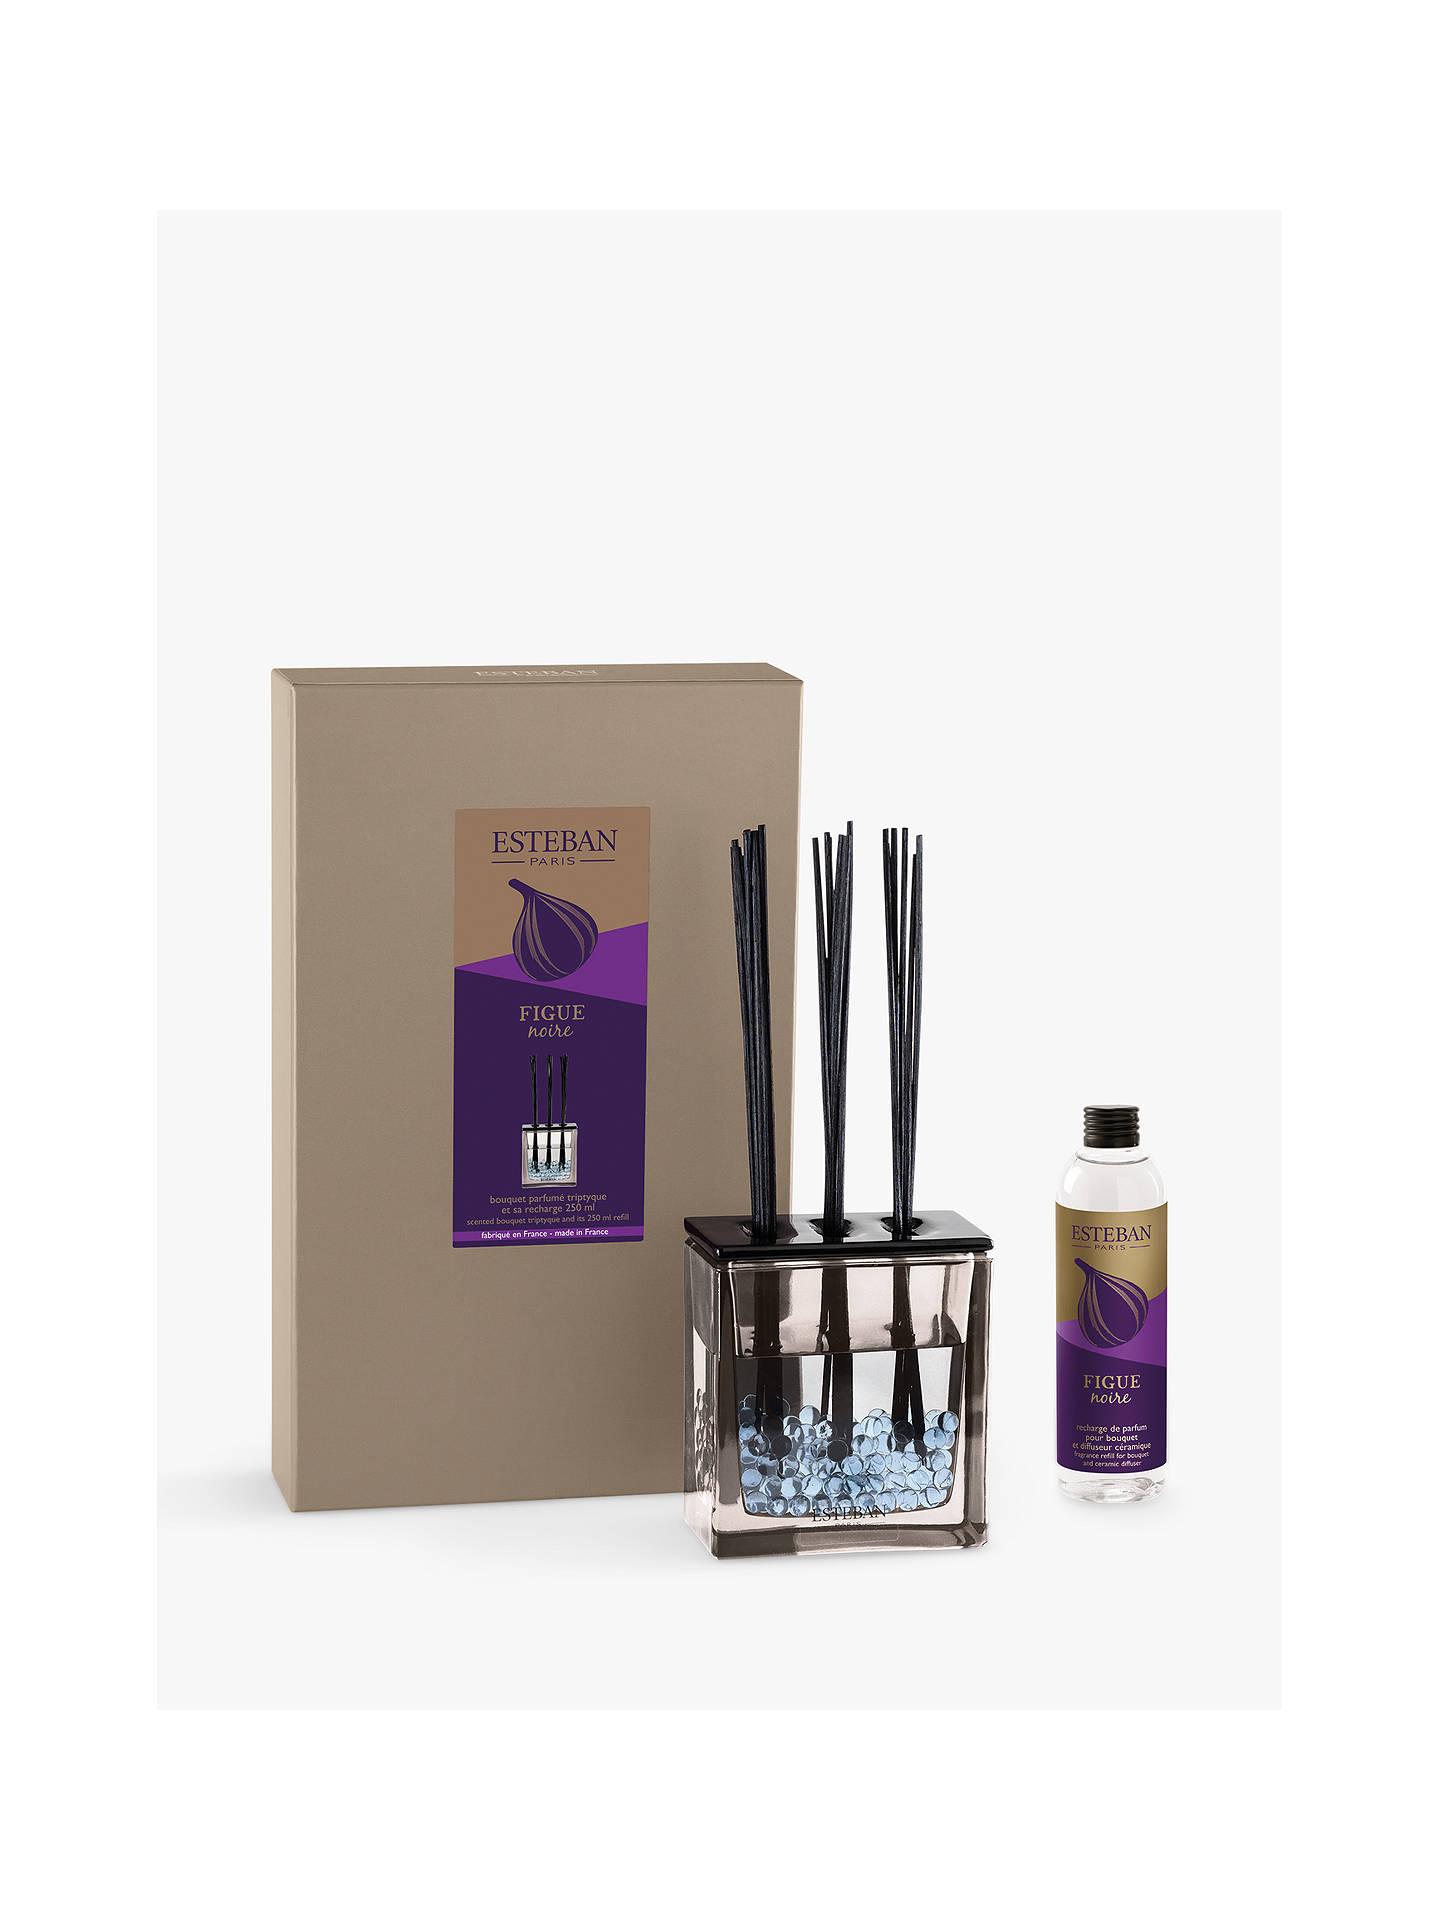 Esteban decorative scented reed diffuser 250ml at john for Decorative diffuser